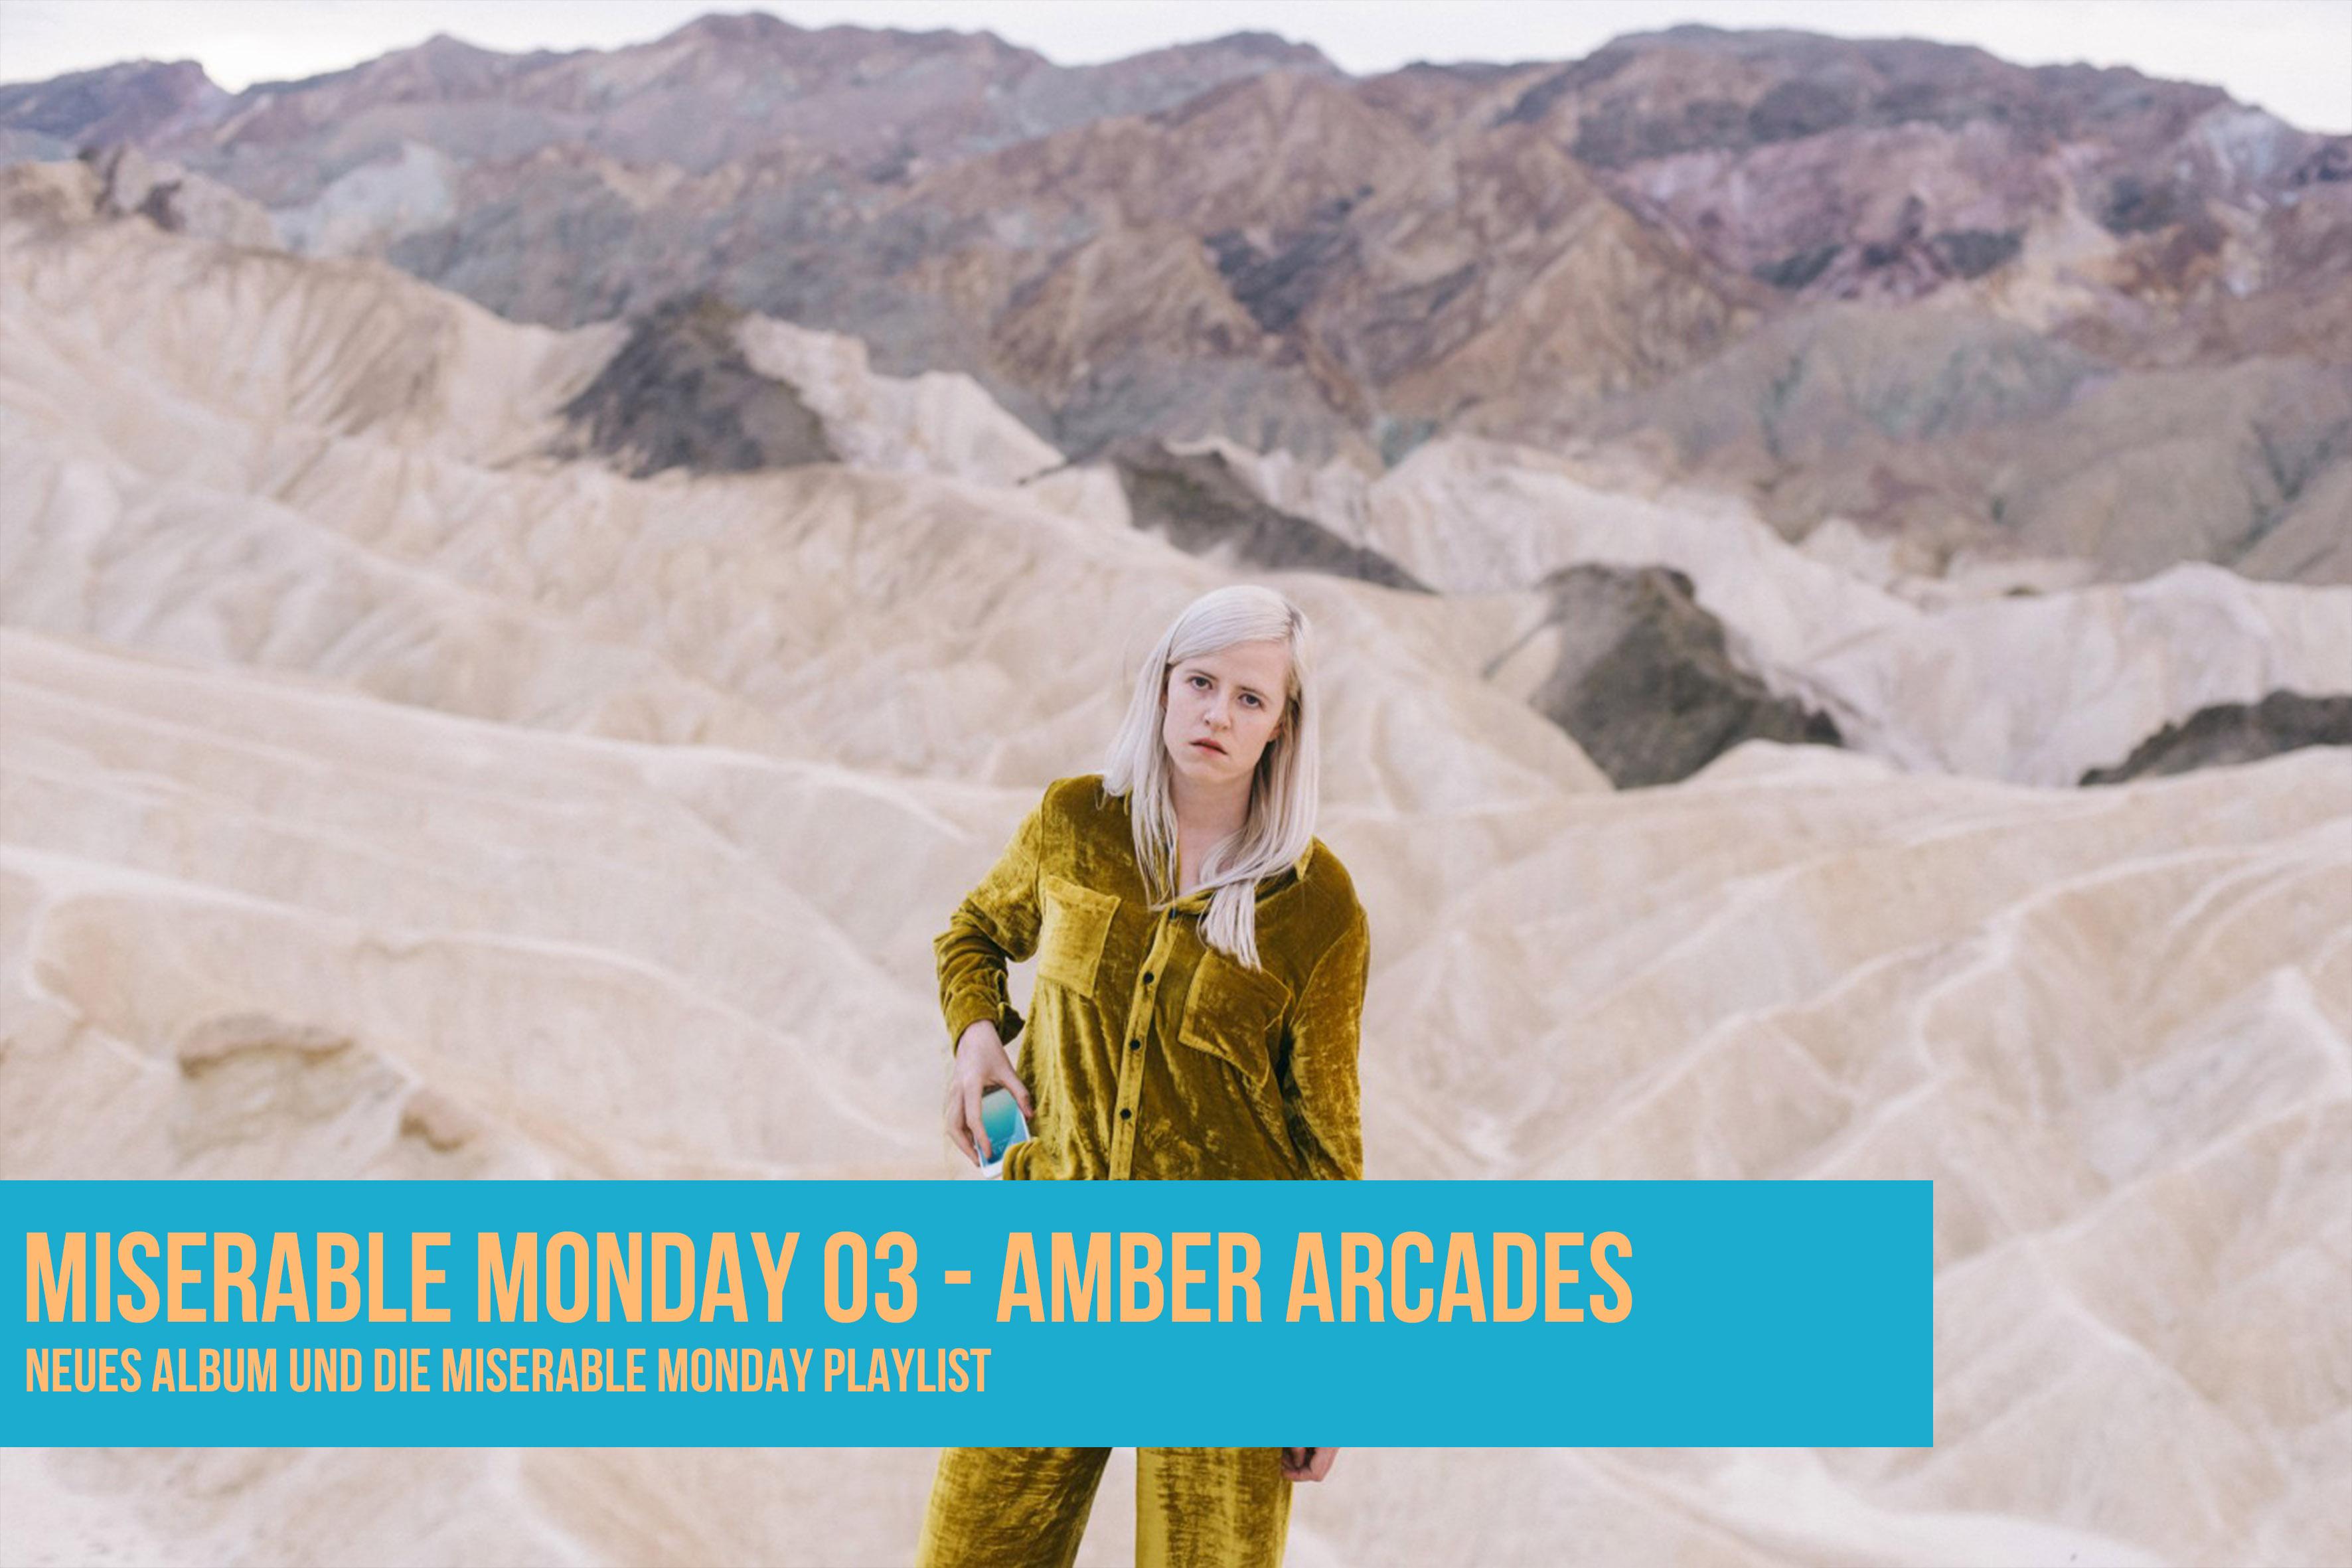 003 - Annelotte De Graaf (Amber Arcades)